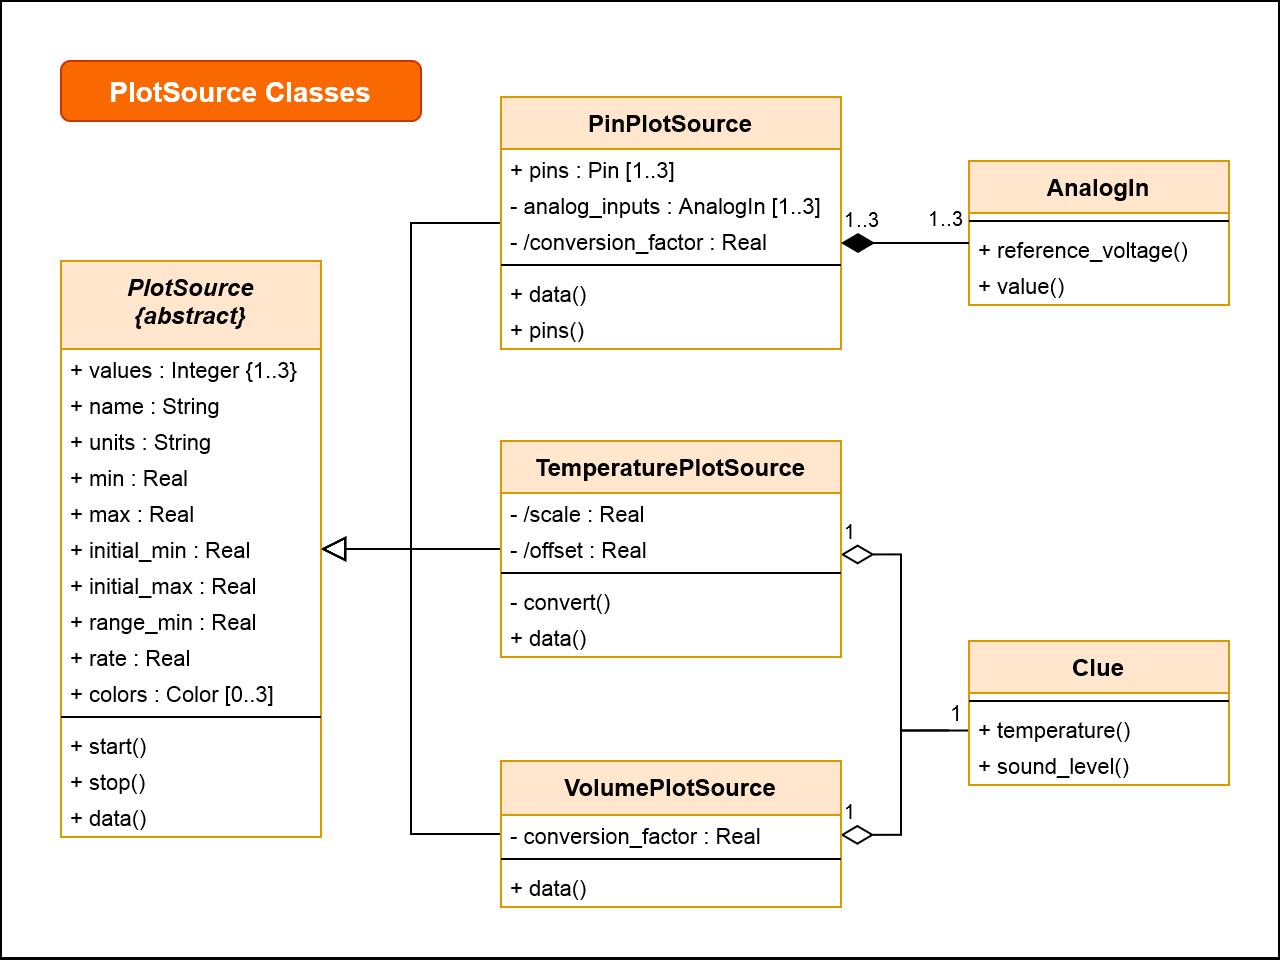 sensors_clue-sensor-plotter-class-plotsource-trio-v4.png